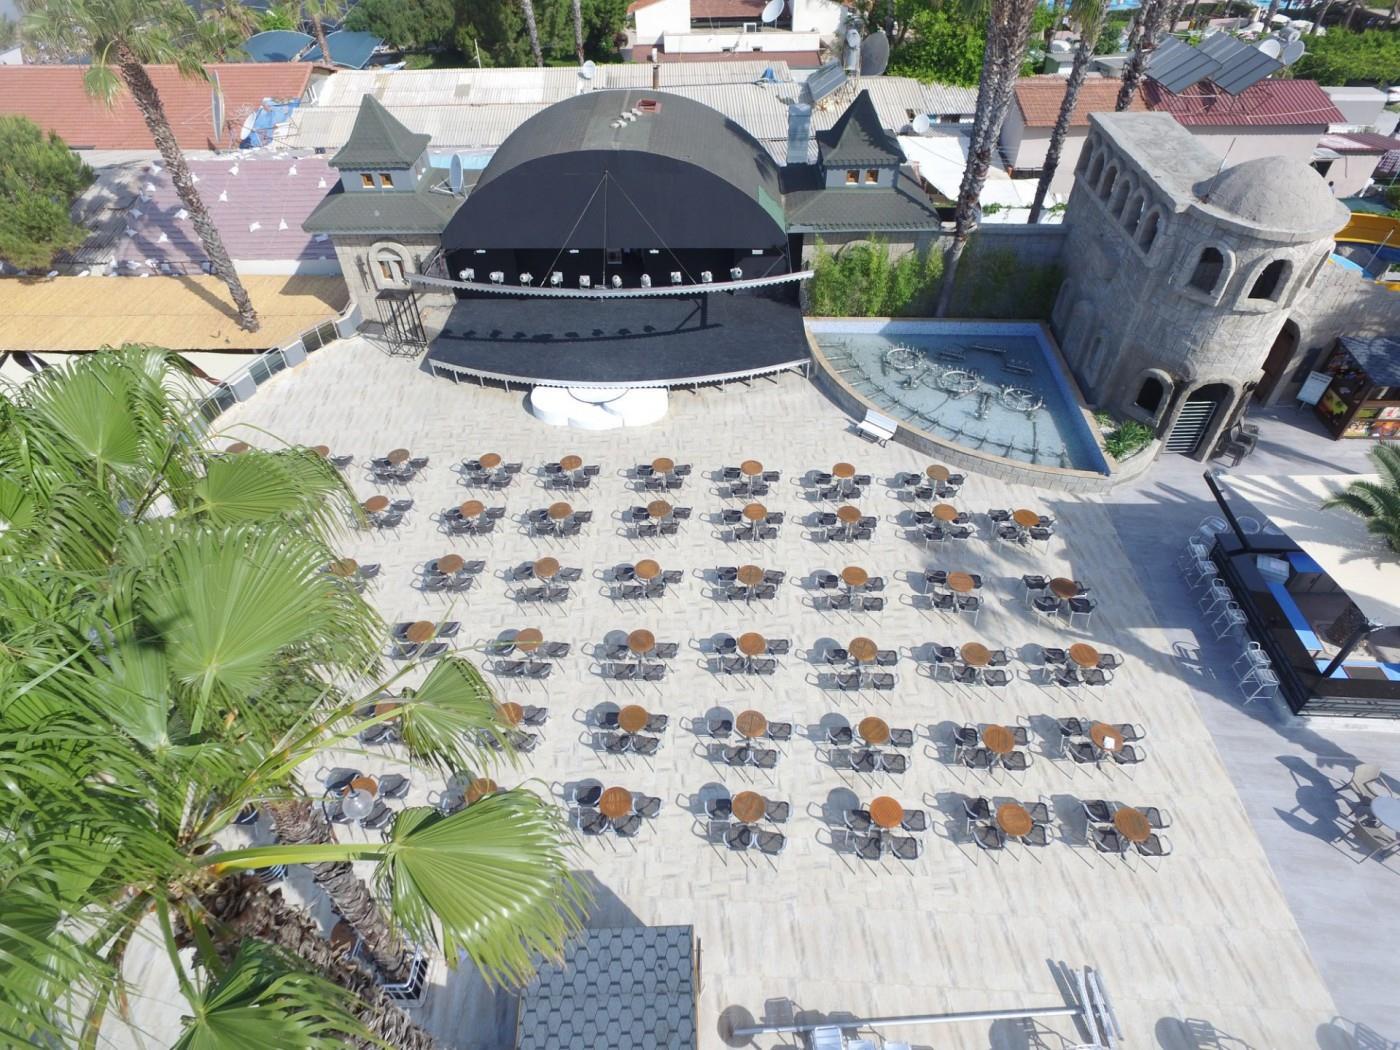 http://www.orextravel.sk/OREX/hotelphotos/thalia-unique-area-003.jpg